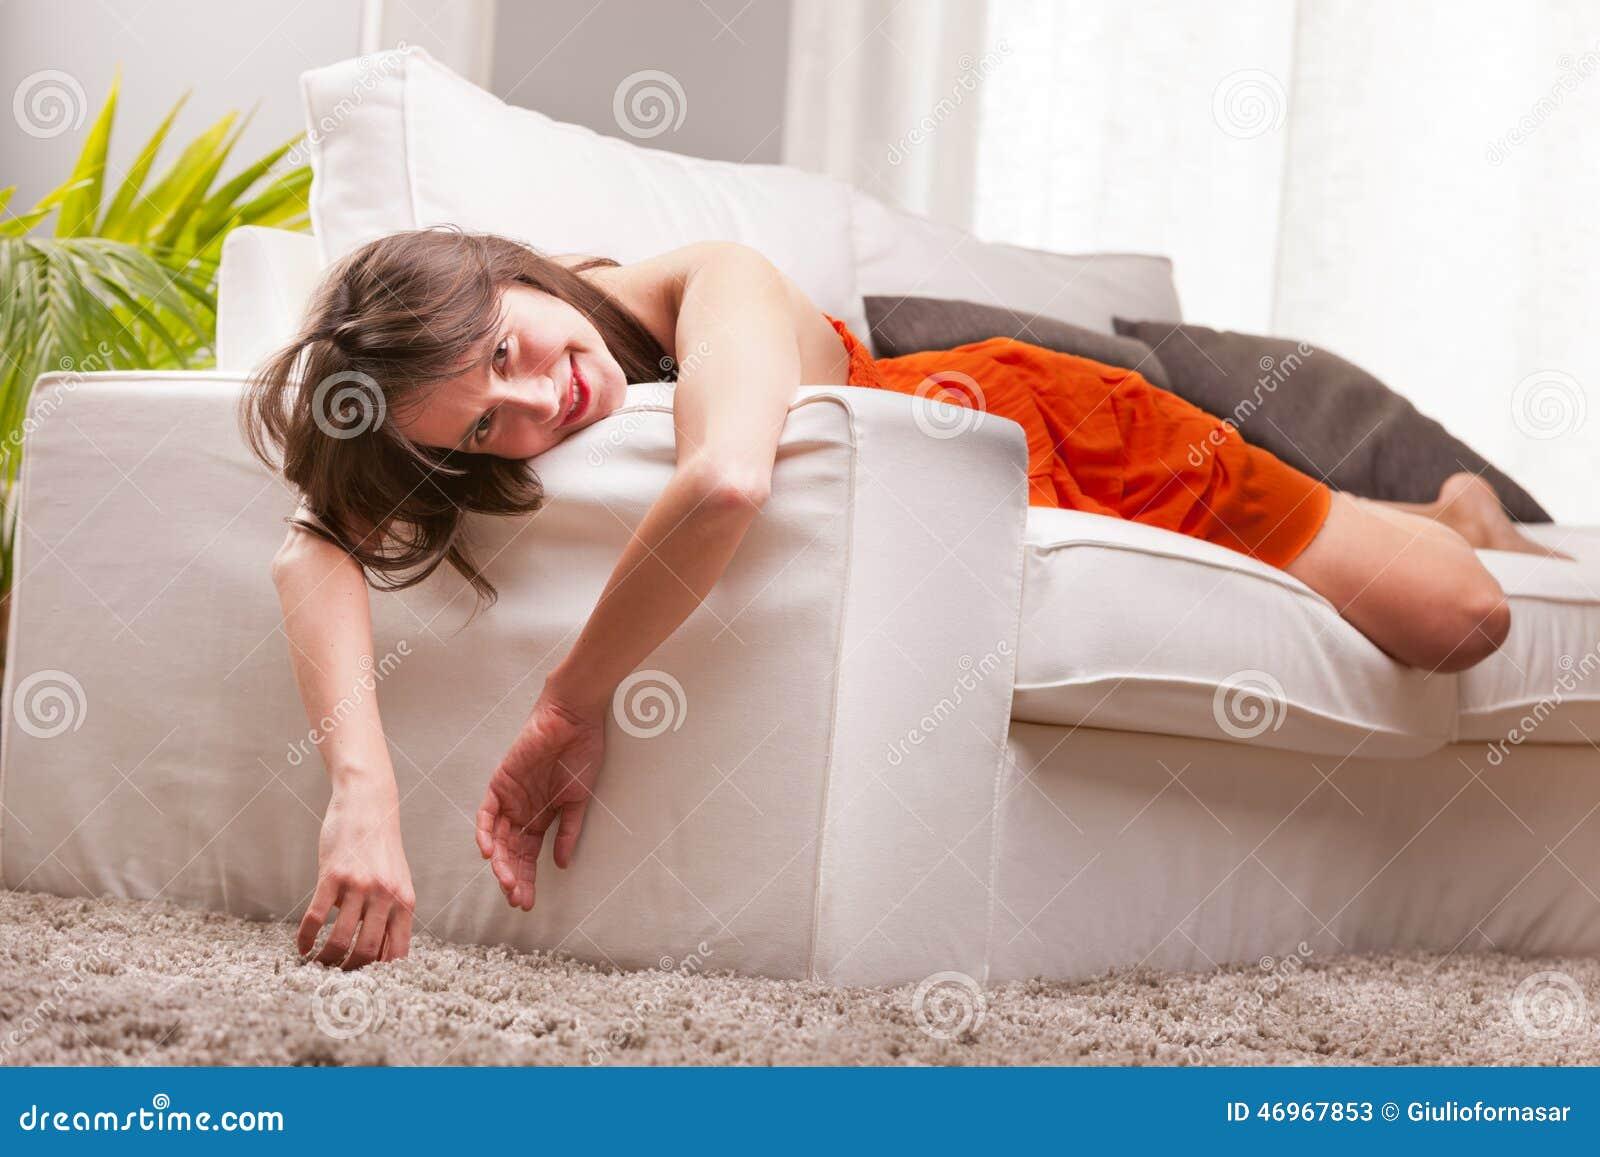 woman softly lying on a sofa